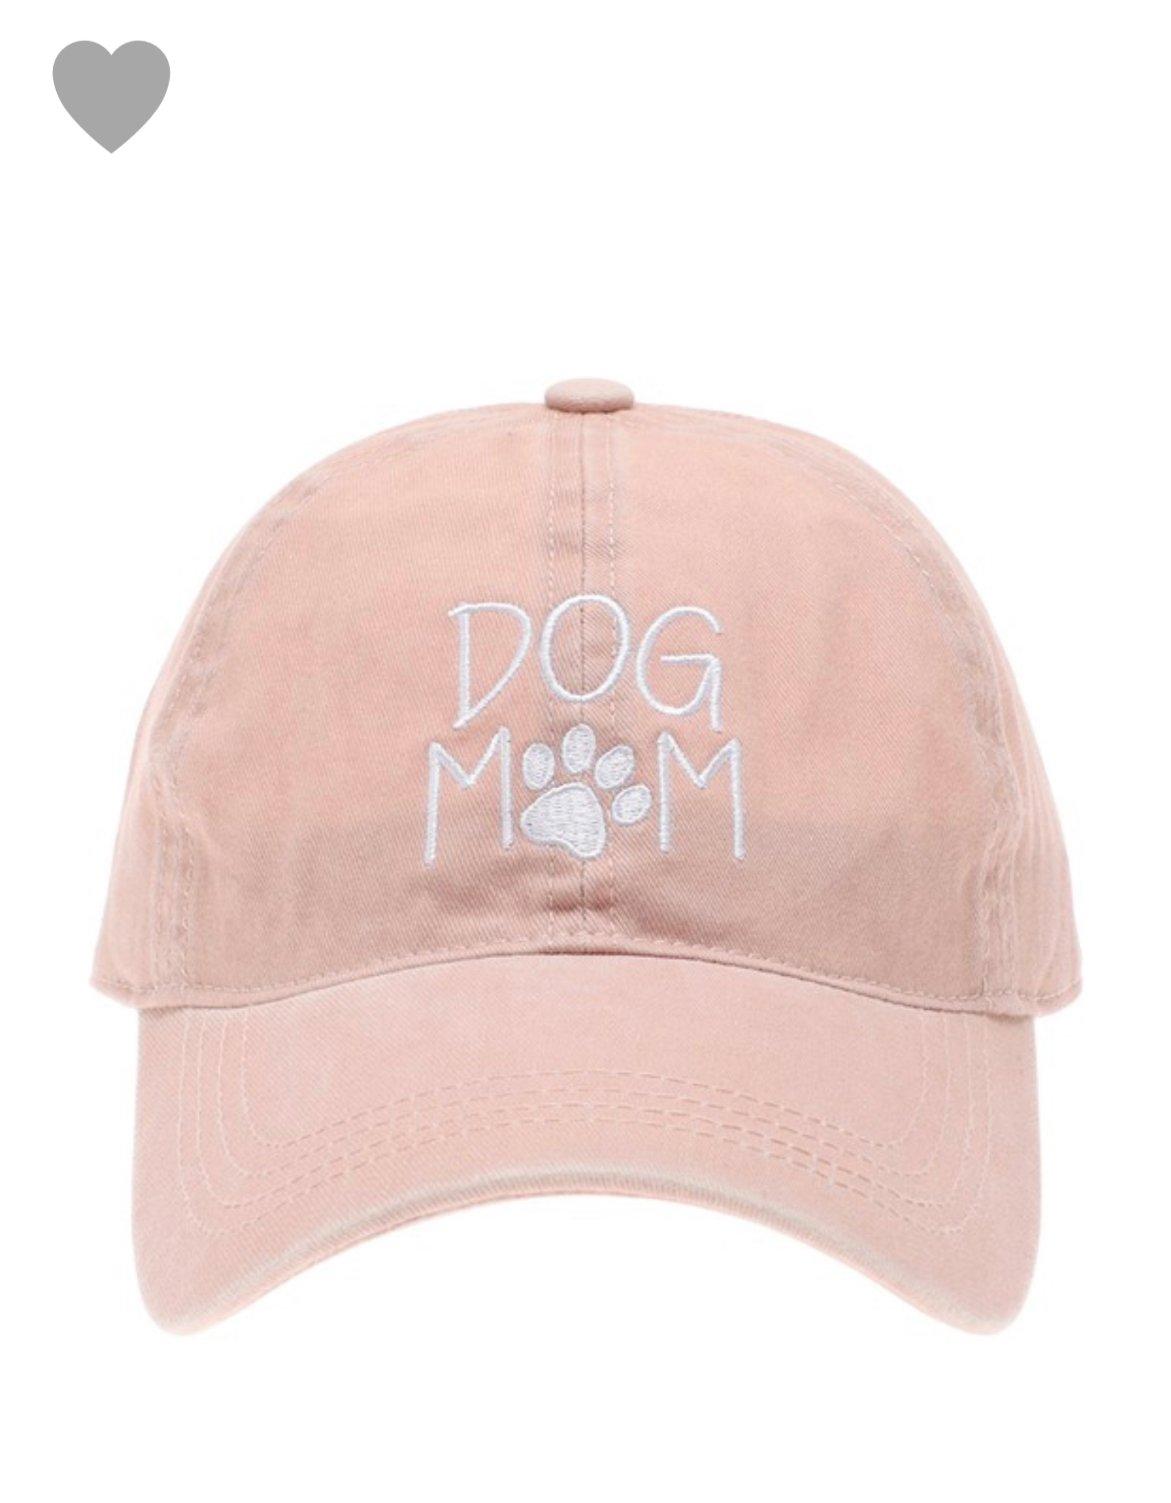 Image of DOG MOM